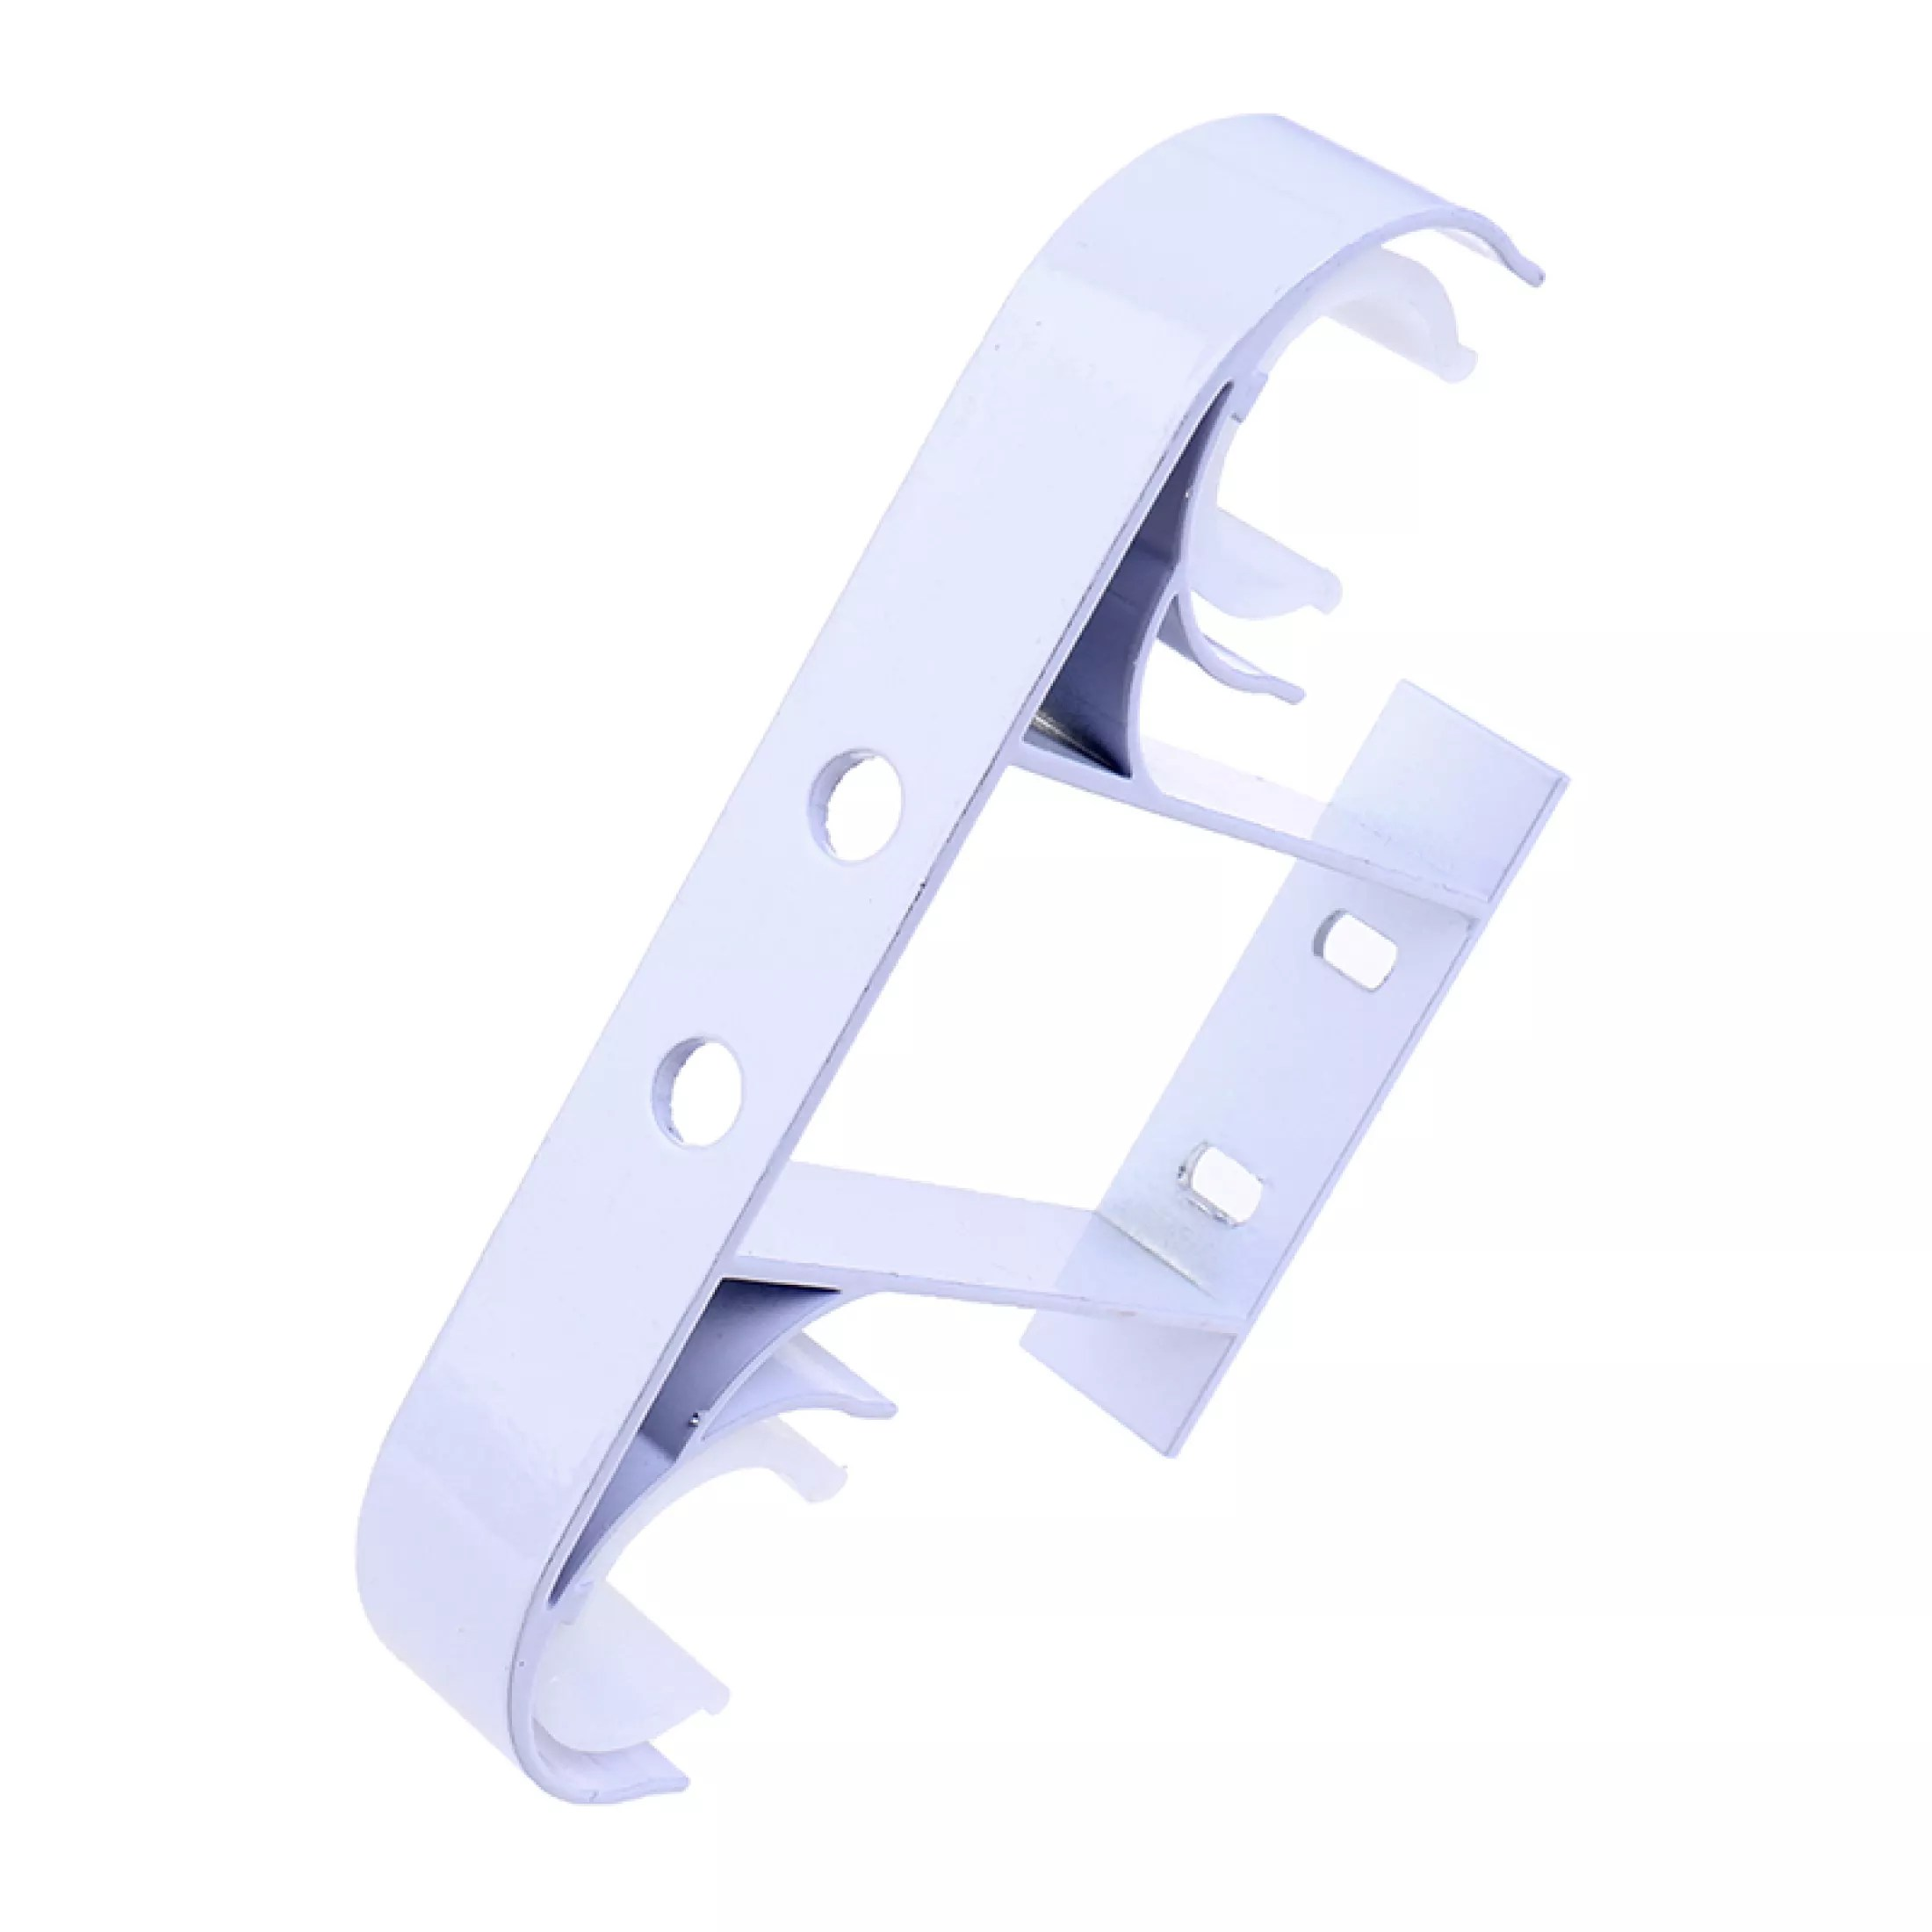 aolie aluminum alloy double curtain rod bracket holder ceiling mounted